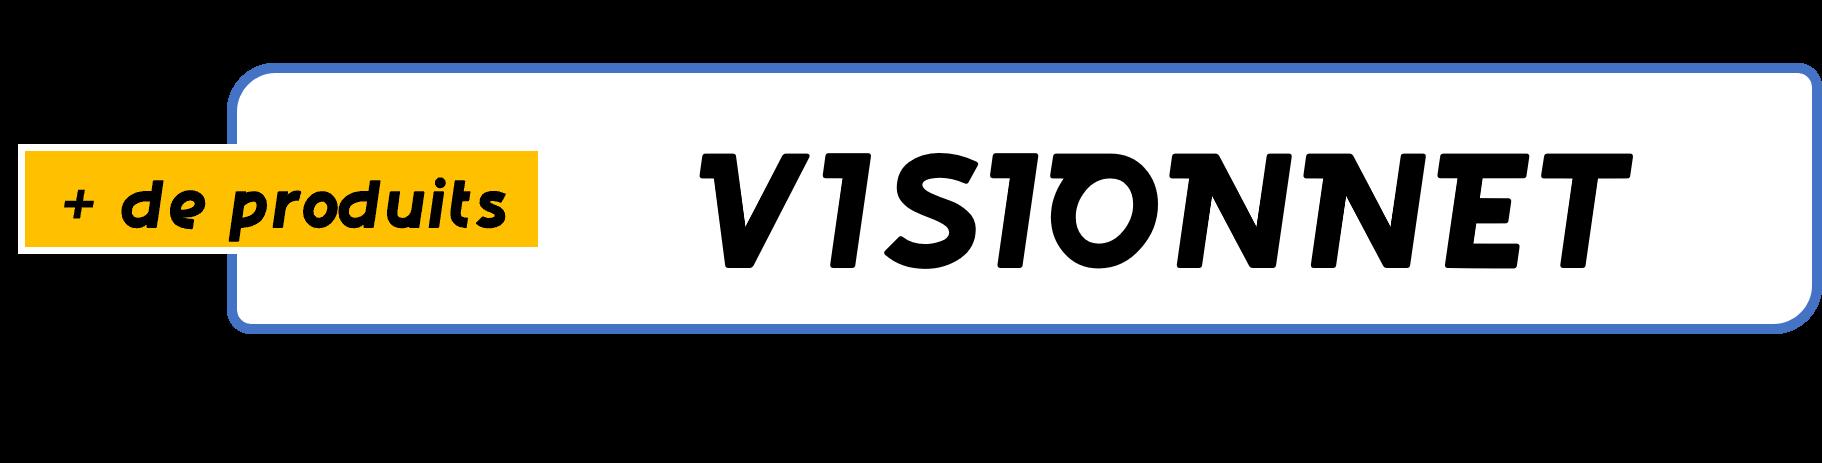 VISIONNET